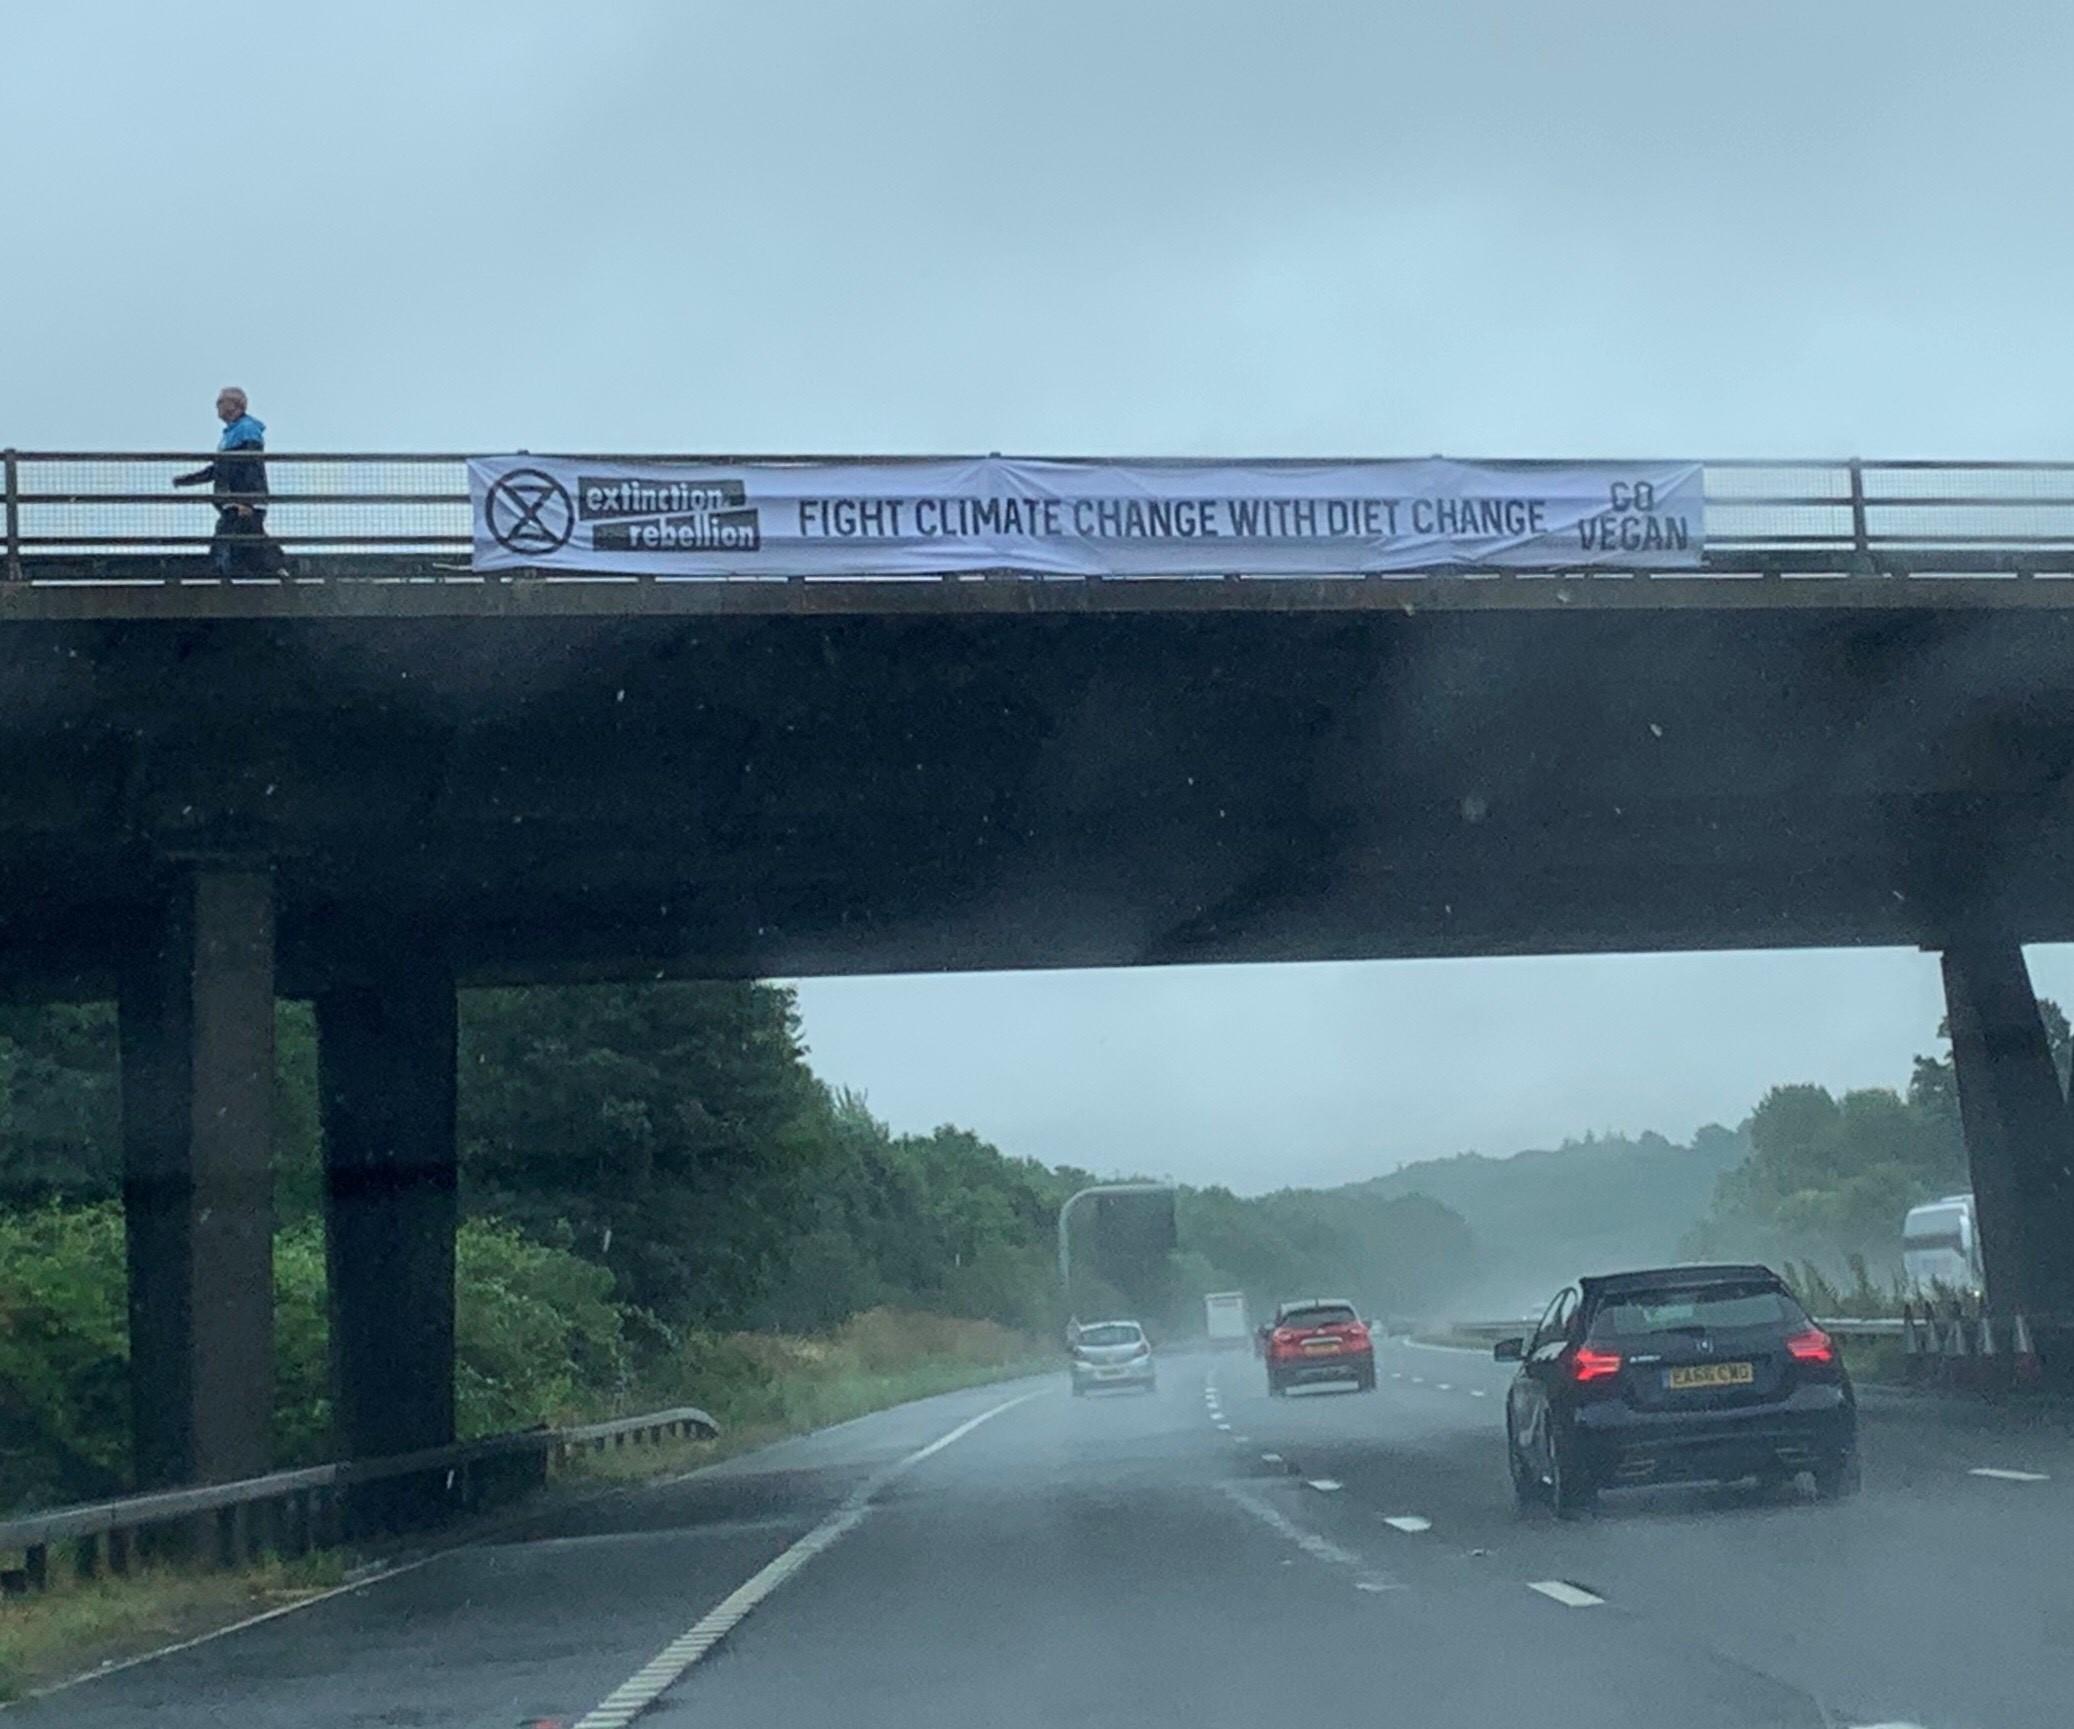 Swindon activists put up banners urging to 'go vegan'